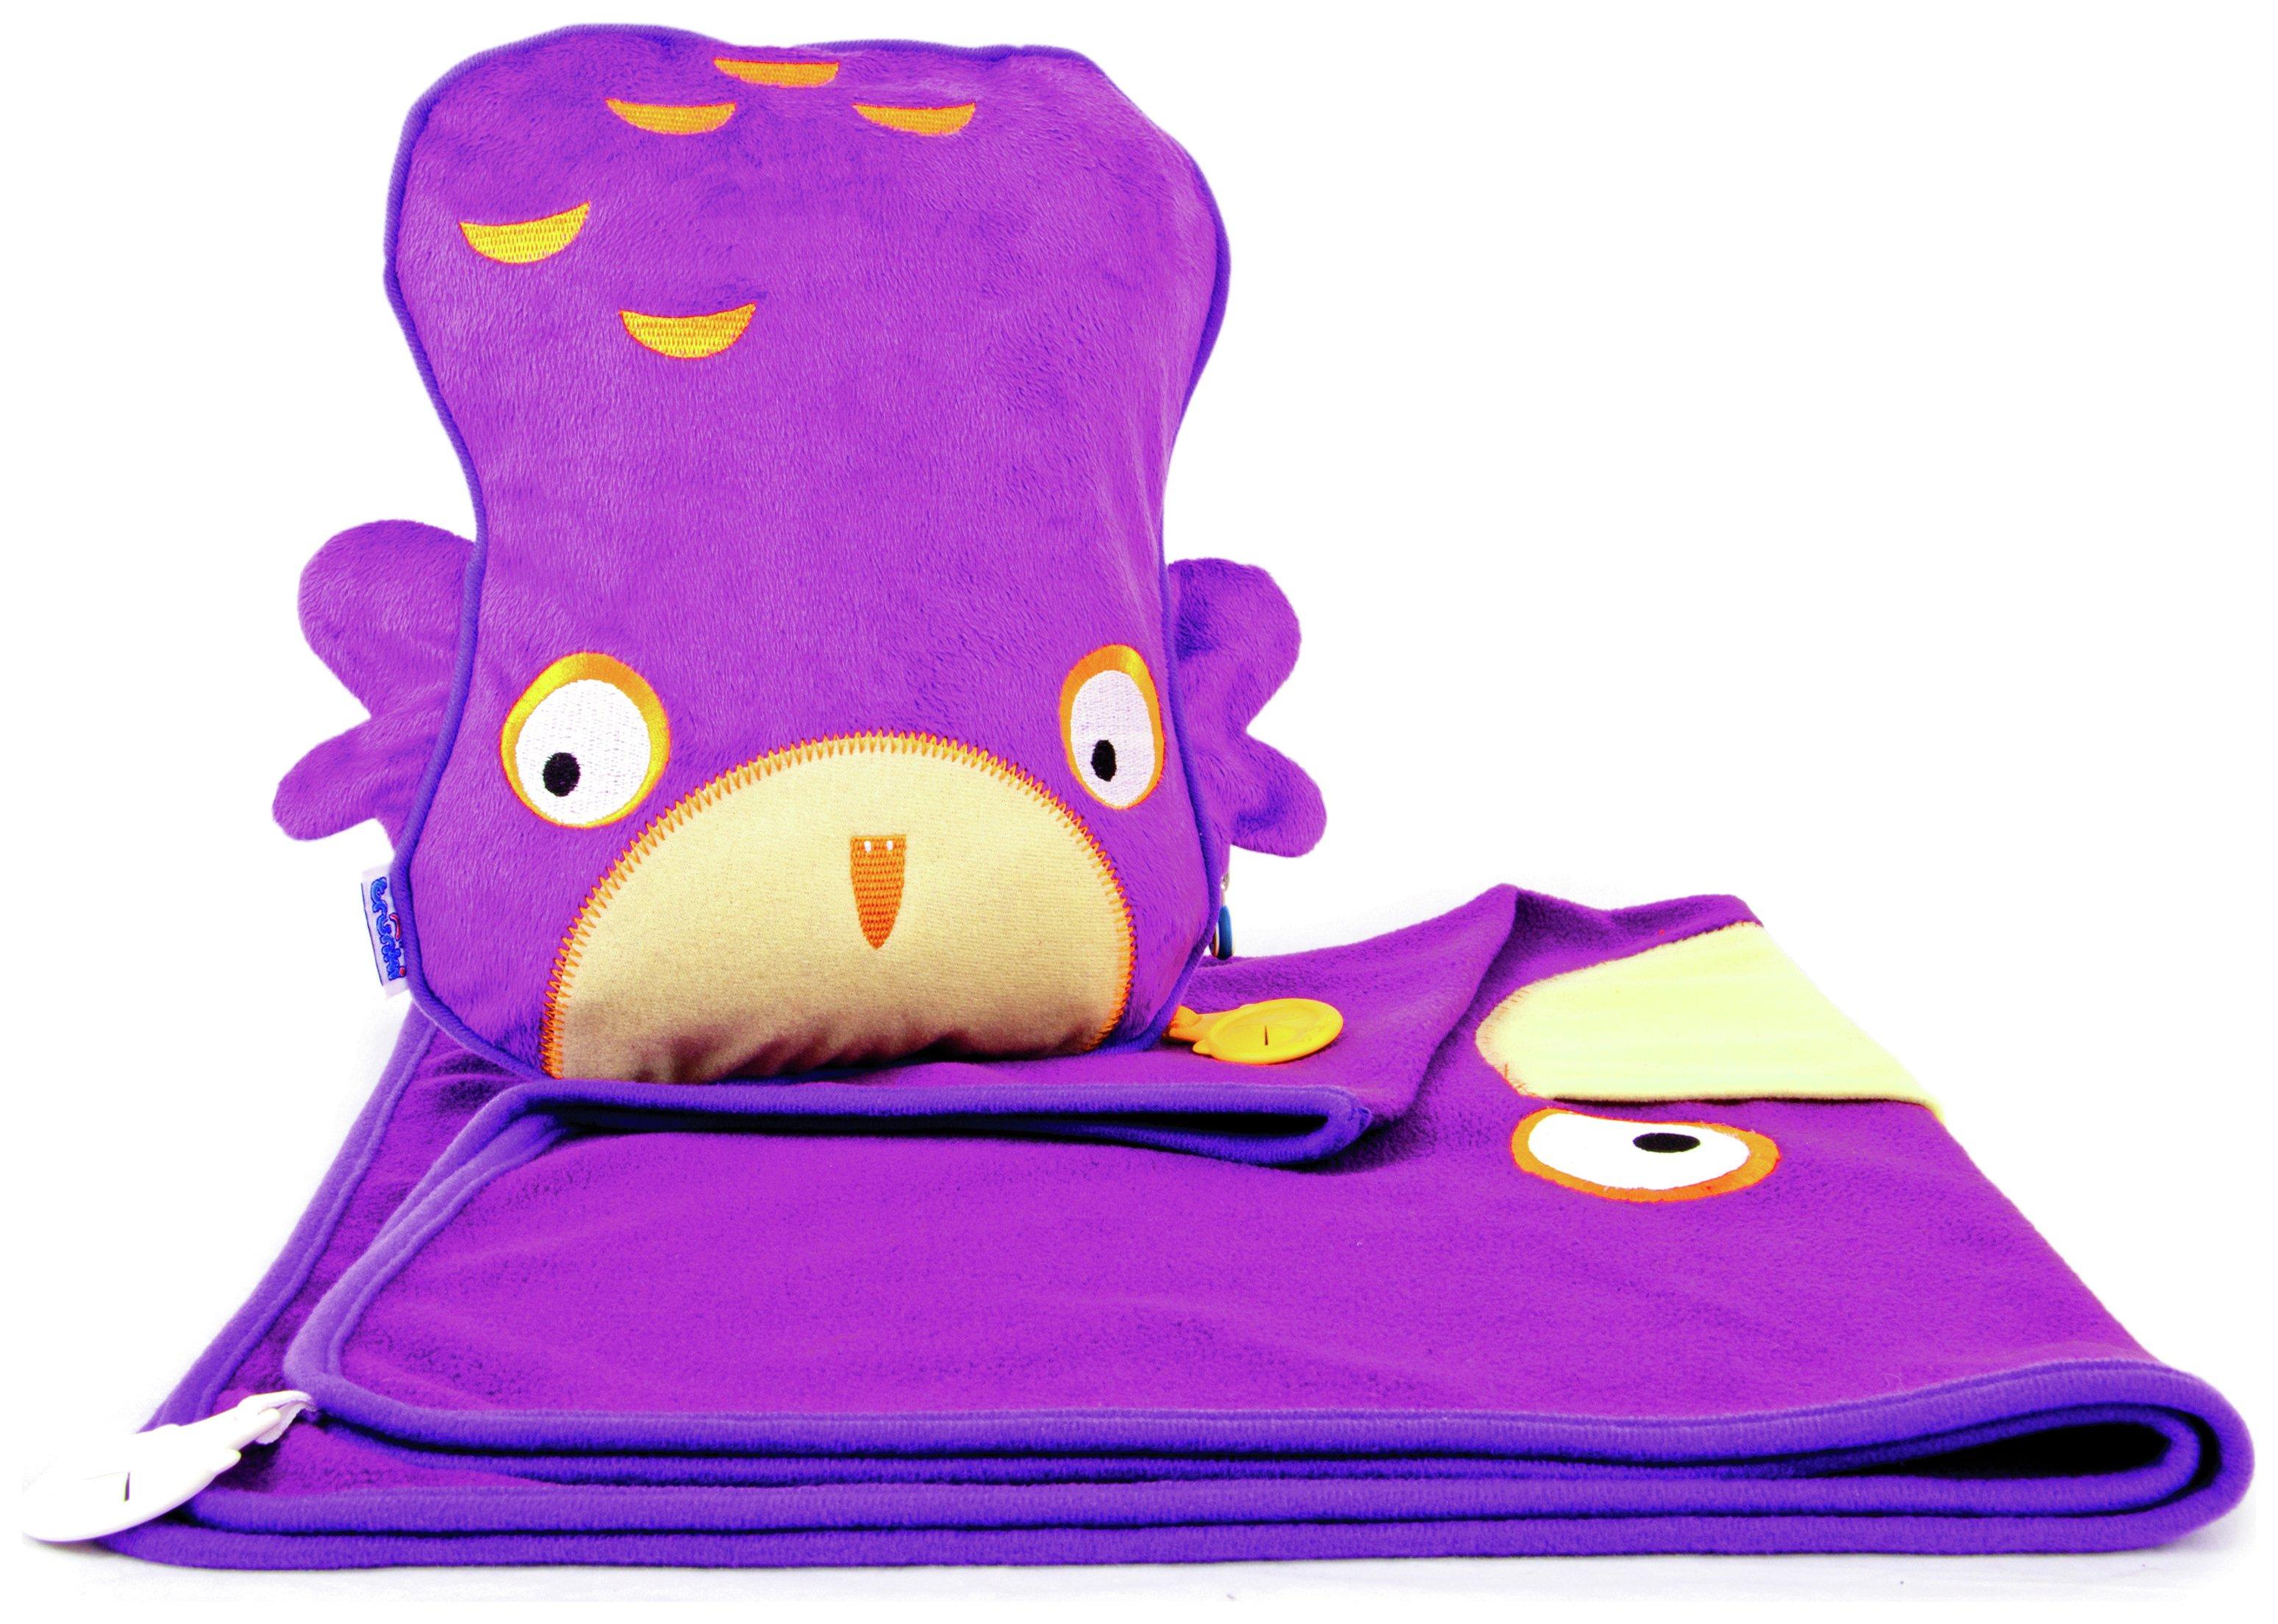 Trunki SnooziHedz Travel Pillow and Blanket - Ollie Owl. lowest price